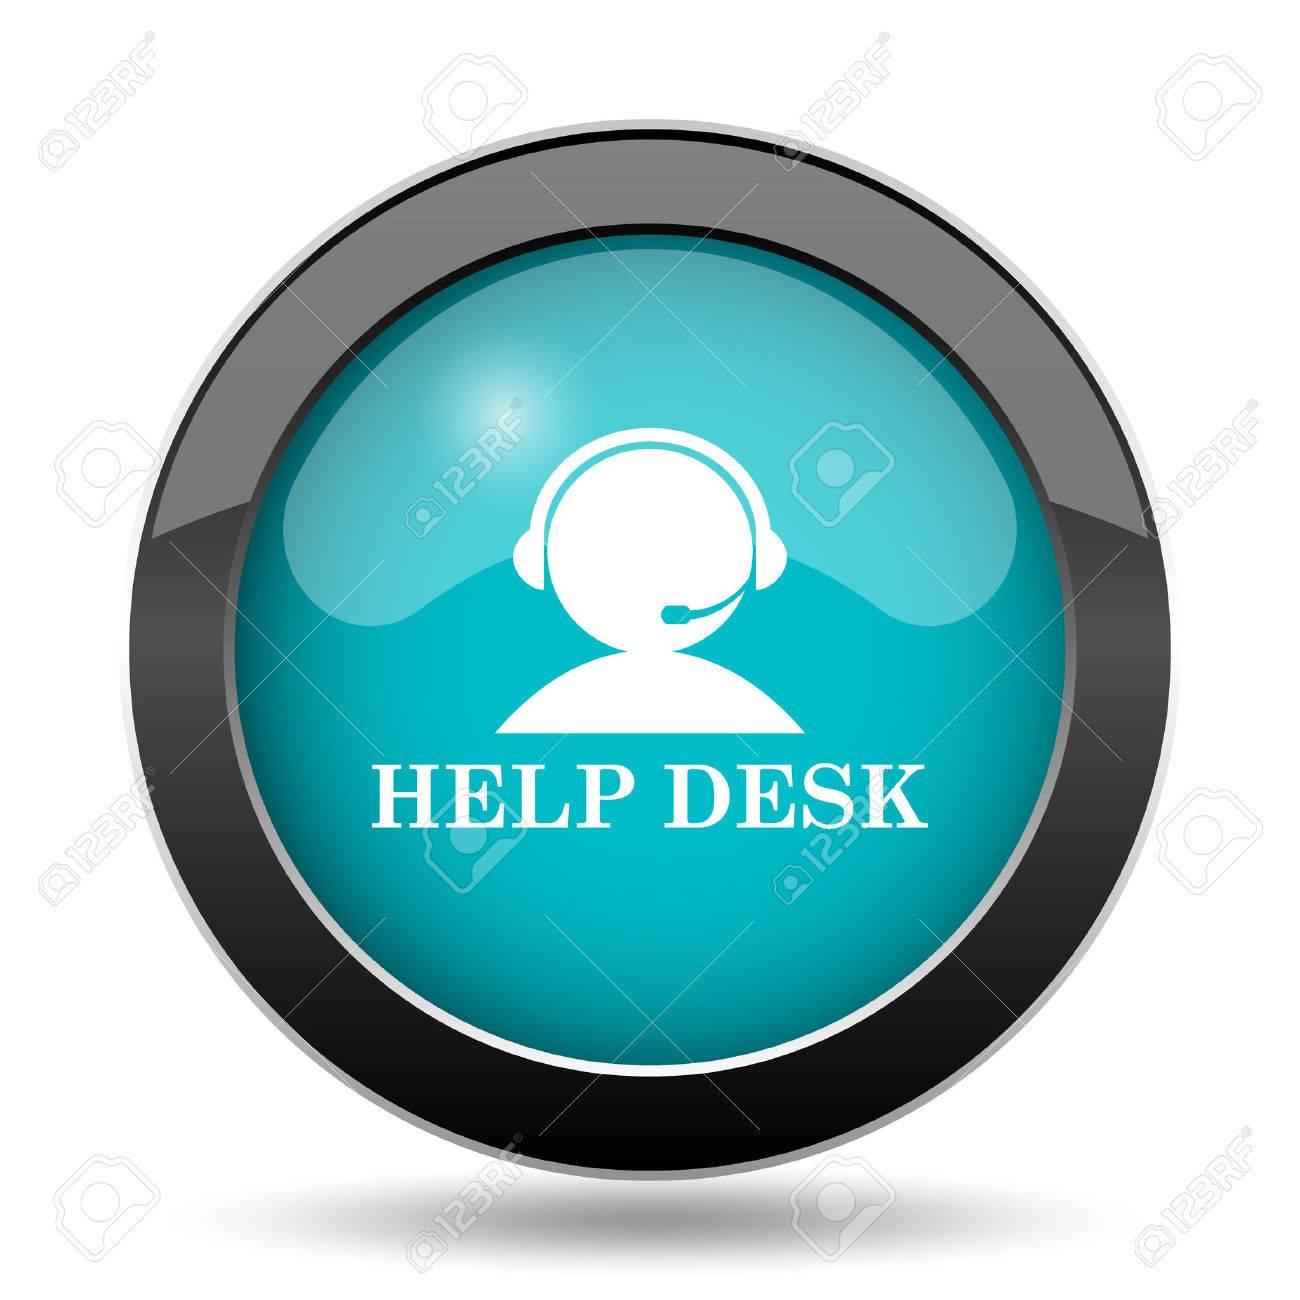 Helpdesk Icon. Helpdesk Website Button On White Background. Stock Photo    66223313